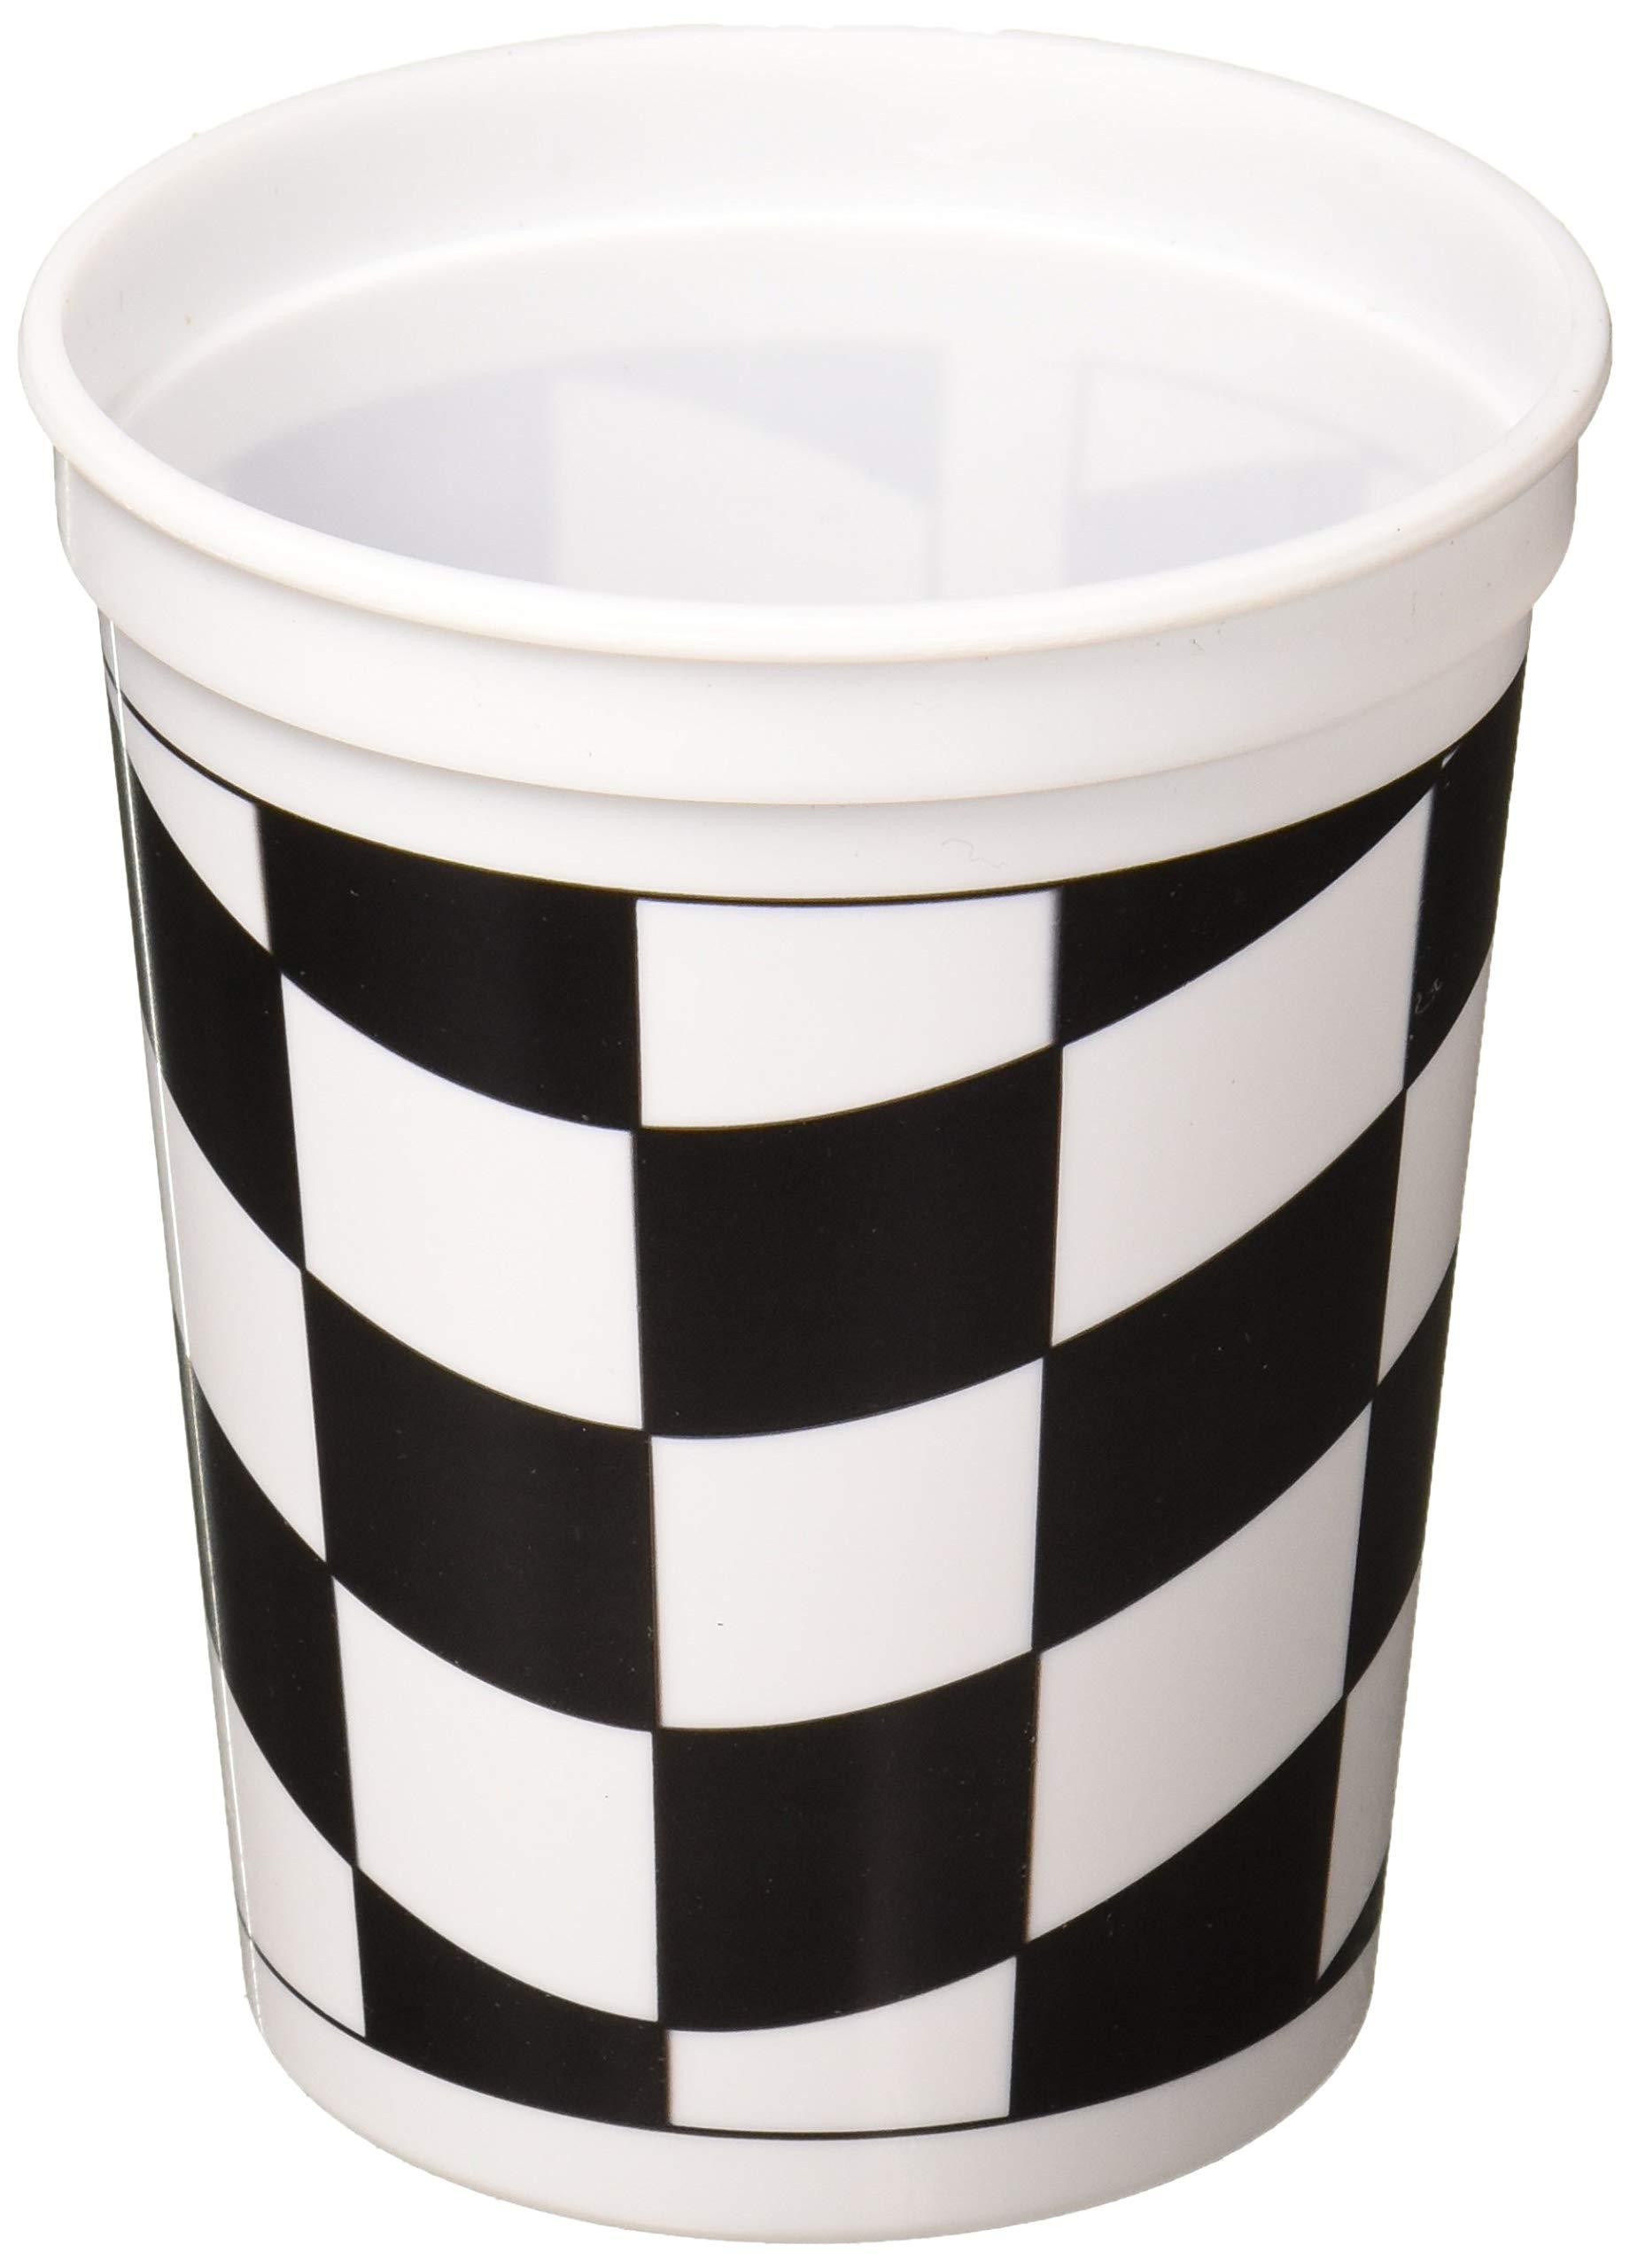 Creative Converting 110546316 Printed Plastic Cup, 16 oz, Black/White